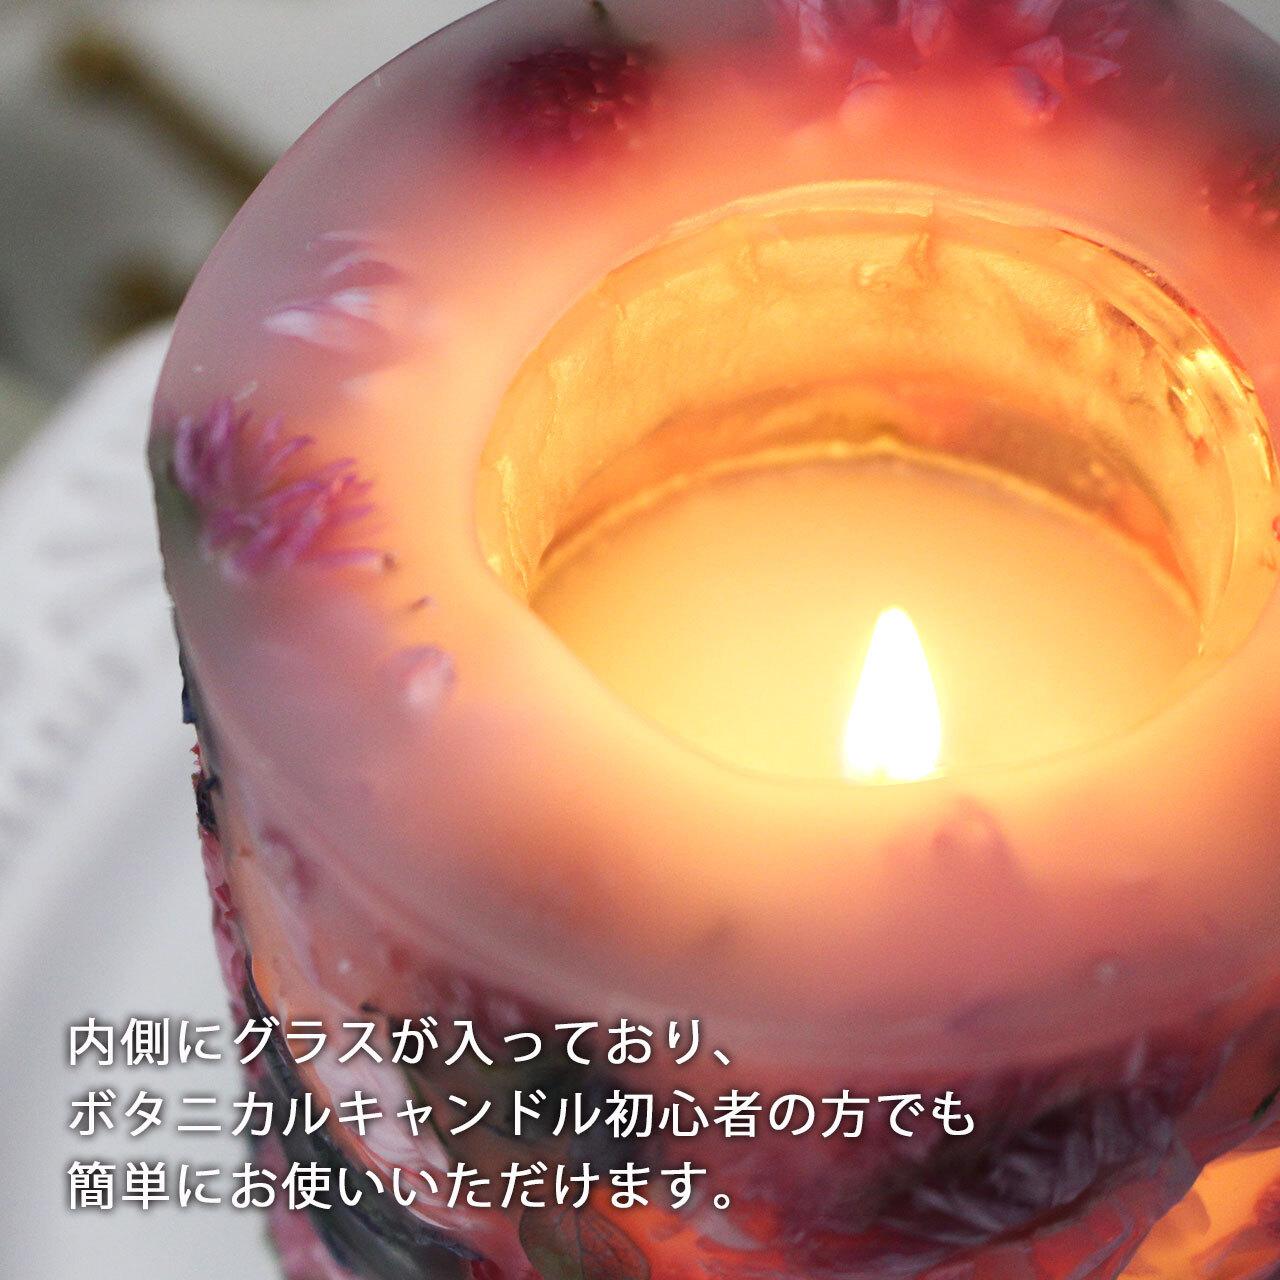 BC696 ガーベラのガーデンボタニカルキャンドル